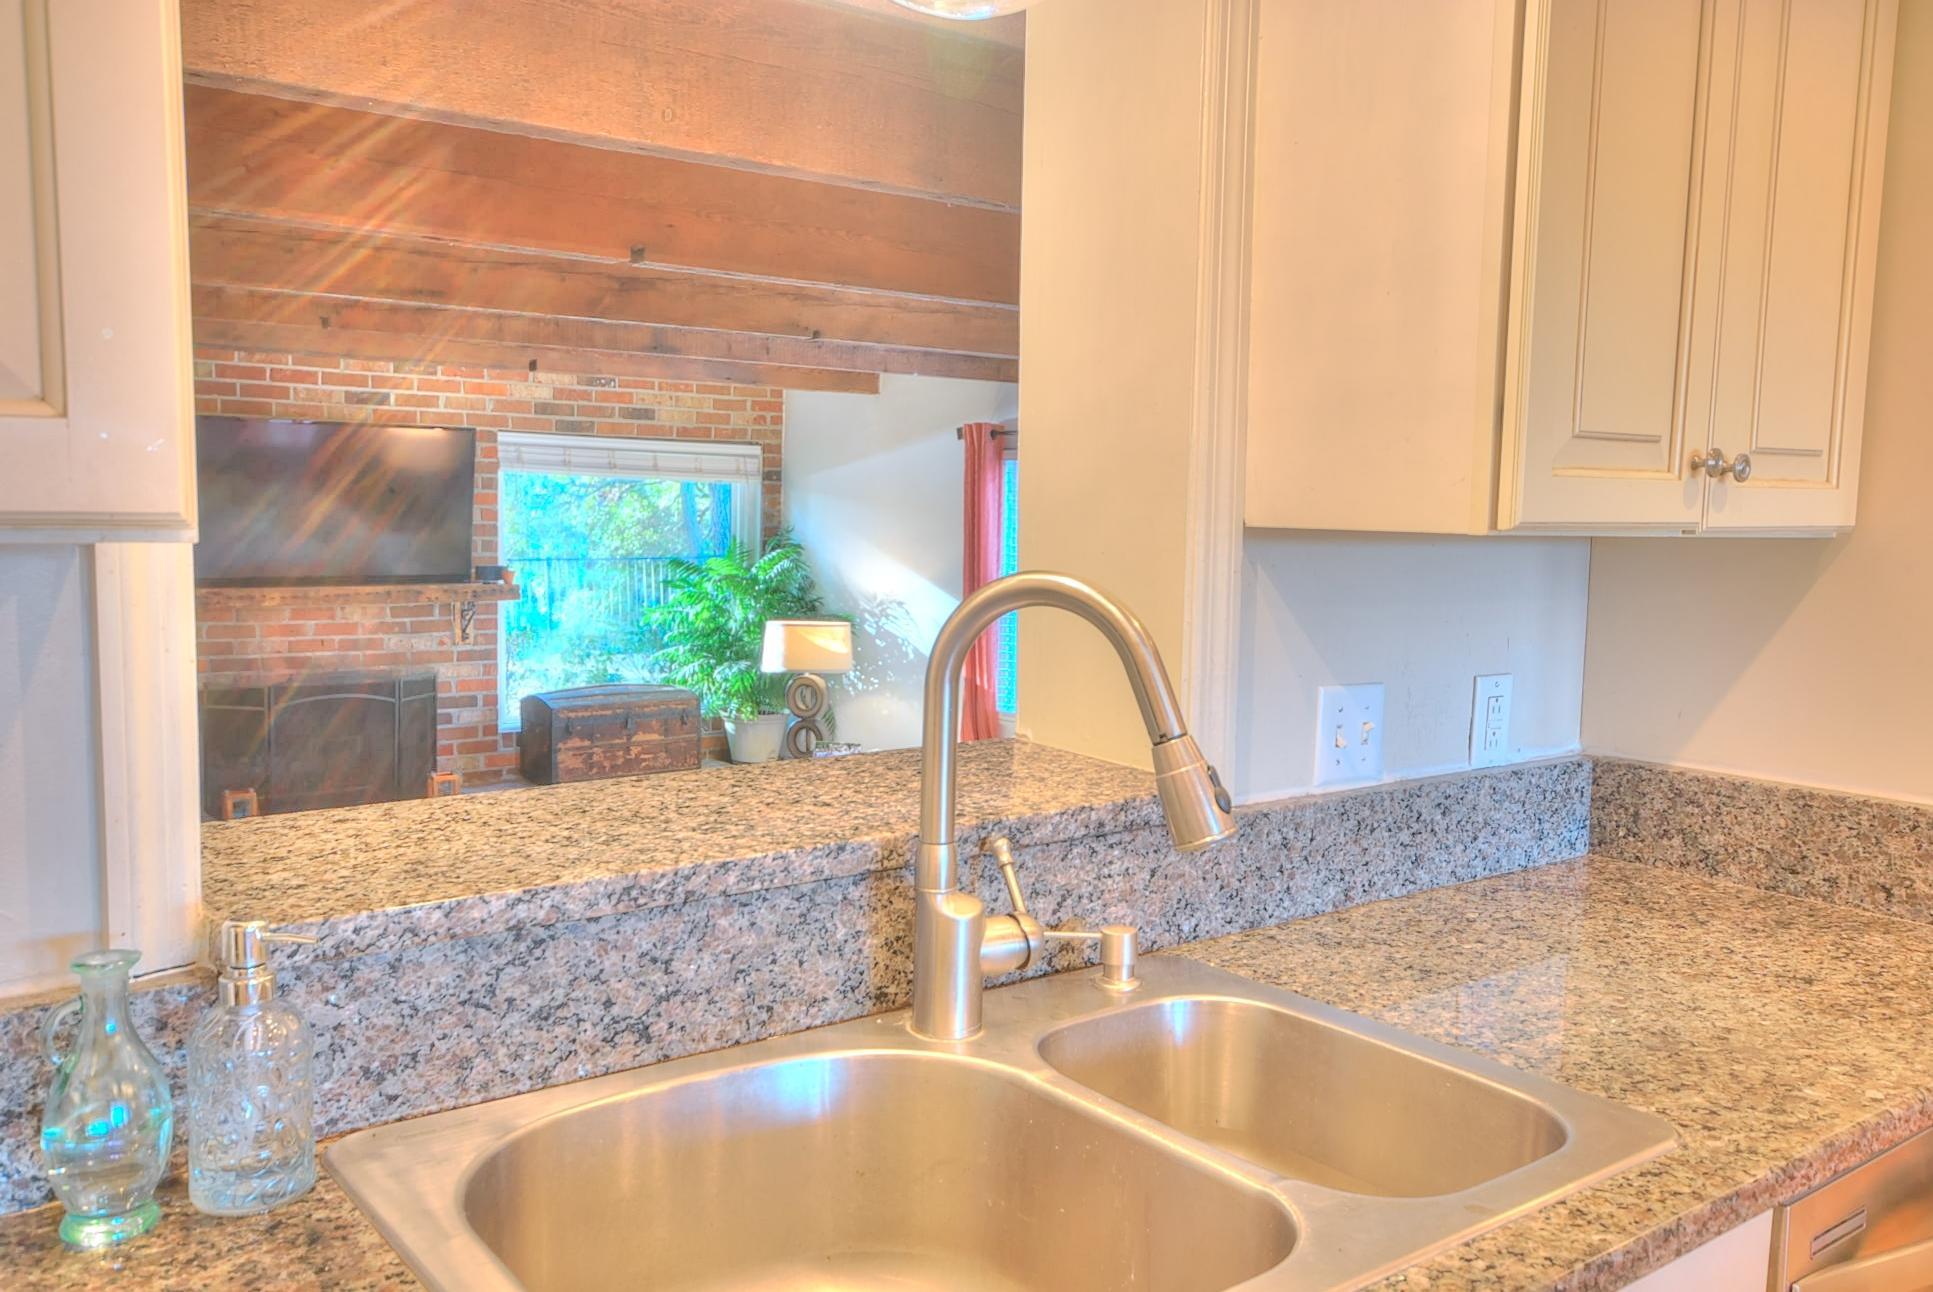 Capri Isles Homes For Sale - 213 Wappoo, Charleston, SC - 33